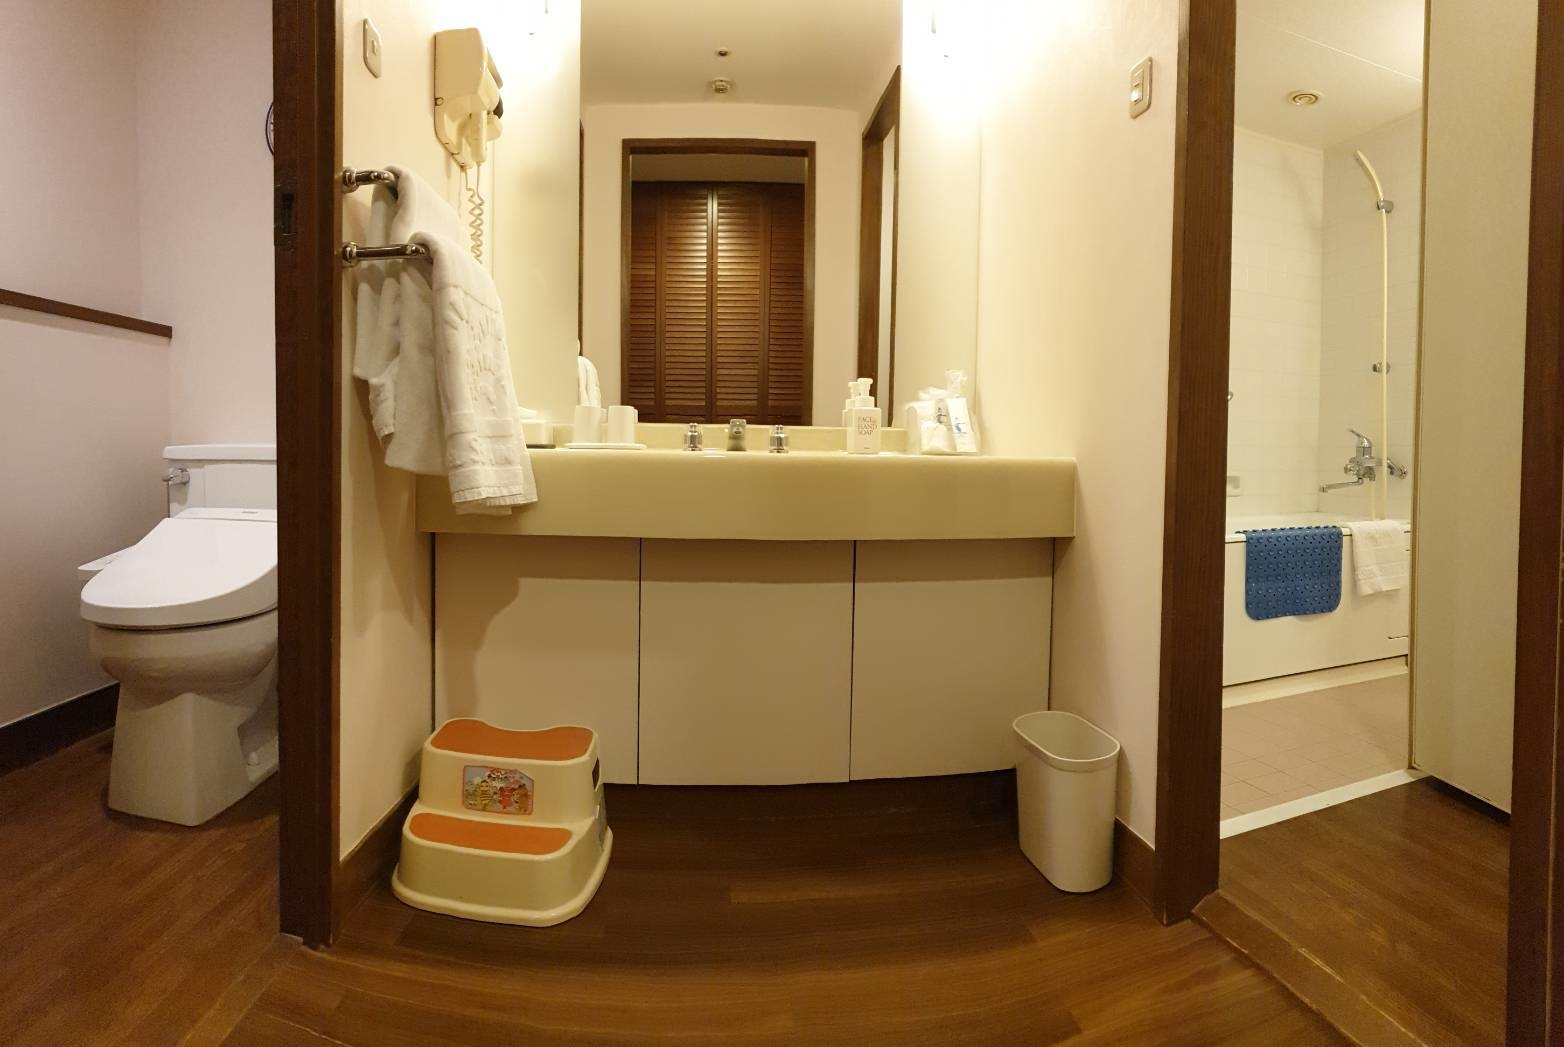 12. Hotel Shima Spai 200213 0007